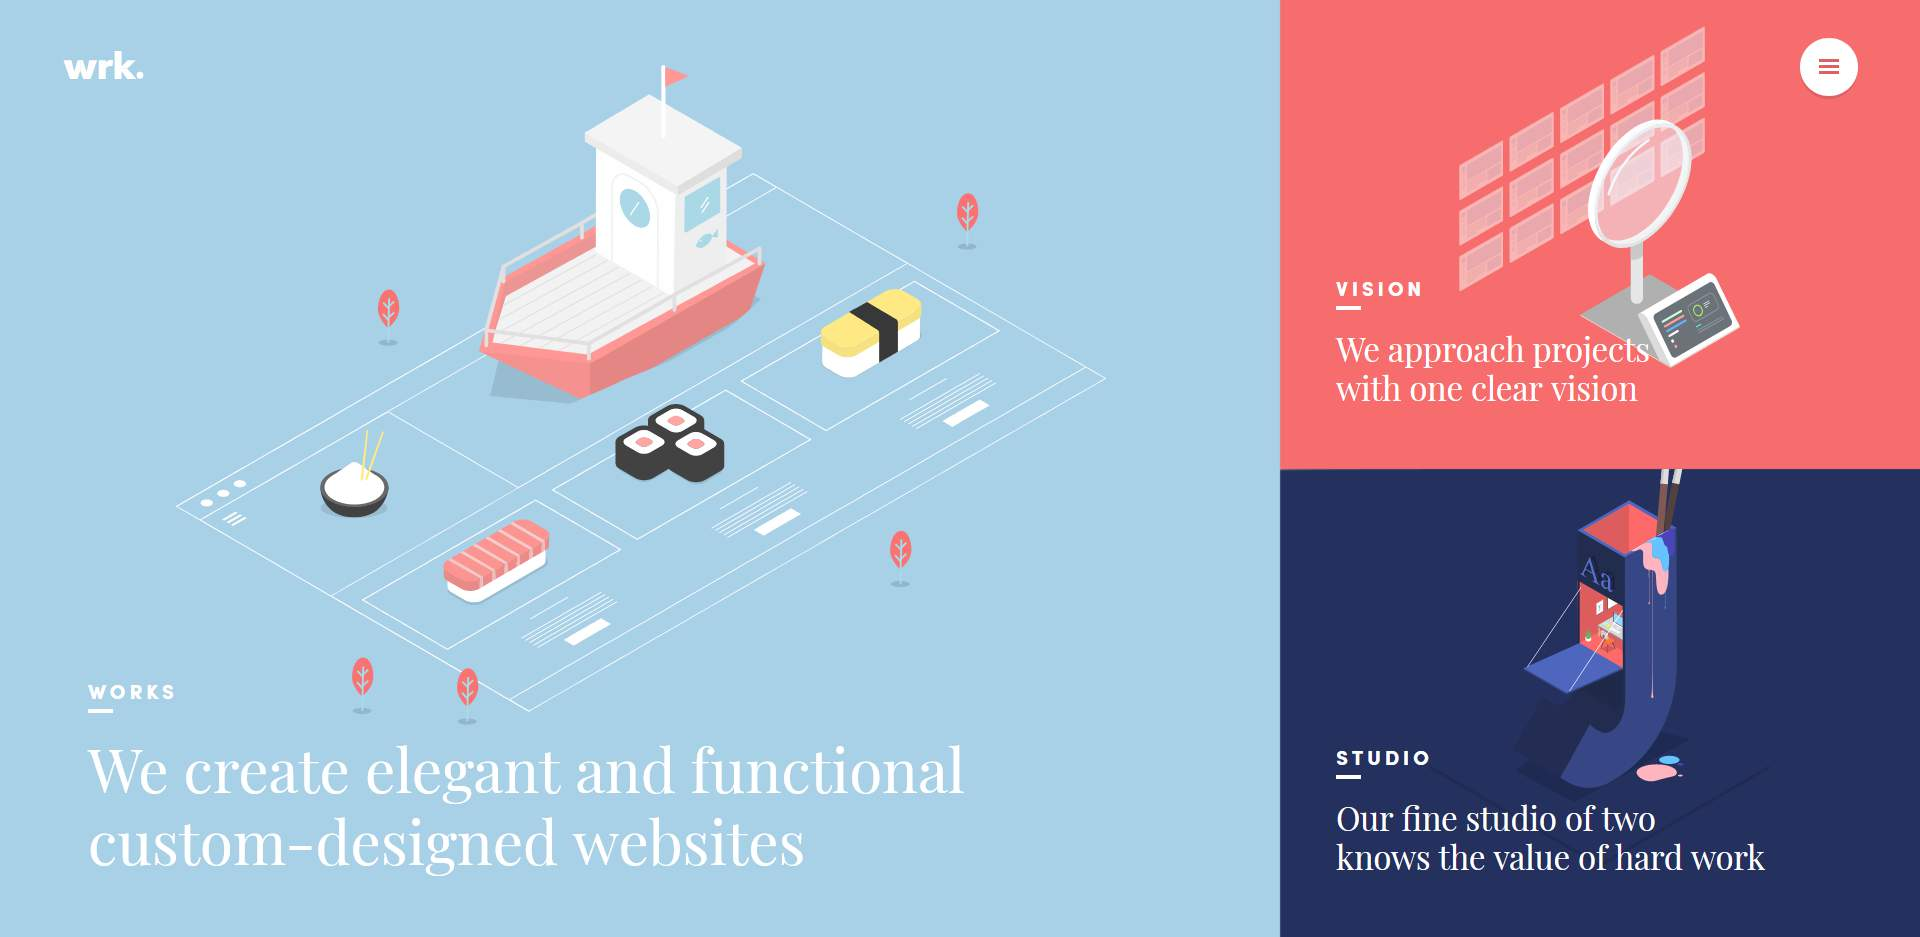 Website of Waaark, a web design agency.